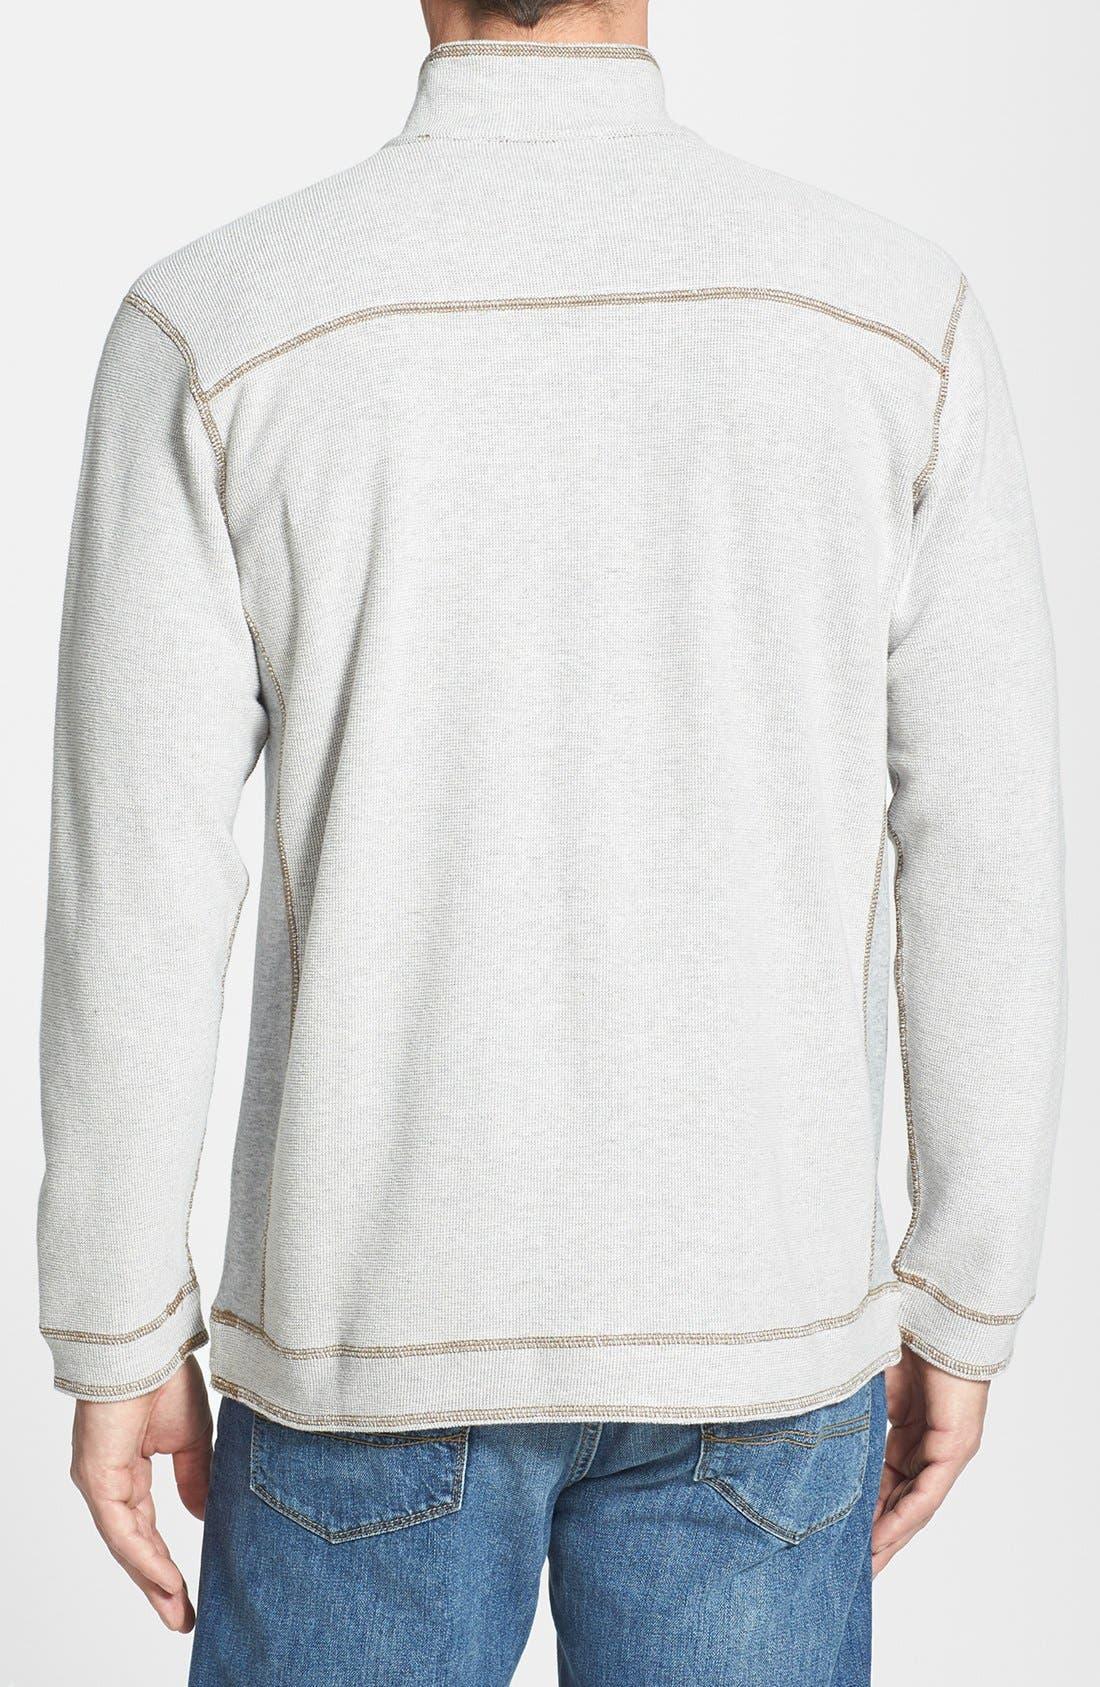 Alternate Image 3  - Tommy Bahama Denim 'Grand Isles' Reversible Half Zip Sweatshirt